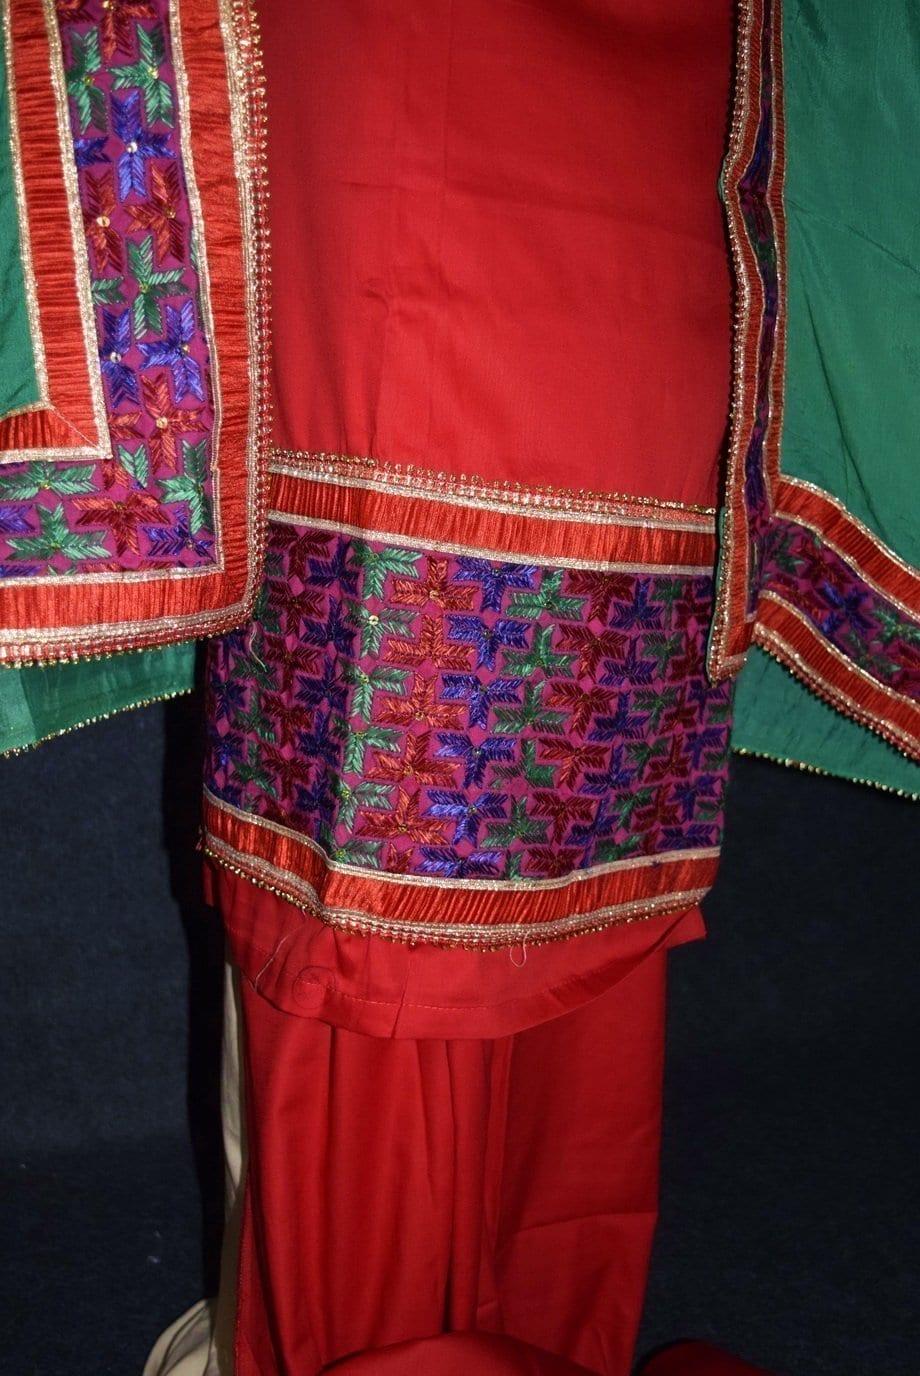 Glazed Cotton Hand Embroidered Salwar kameez suit CHINON DUPATTA set F0661 4